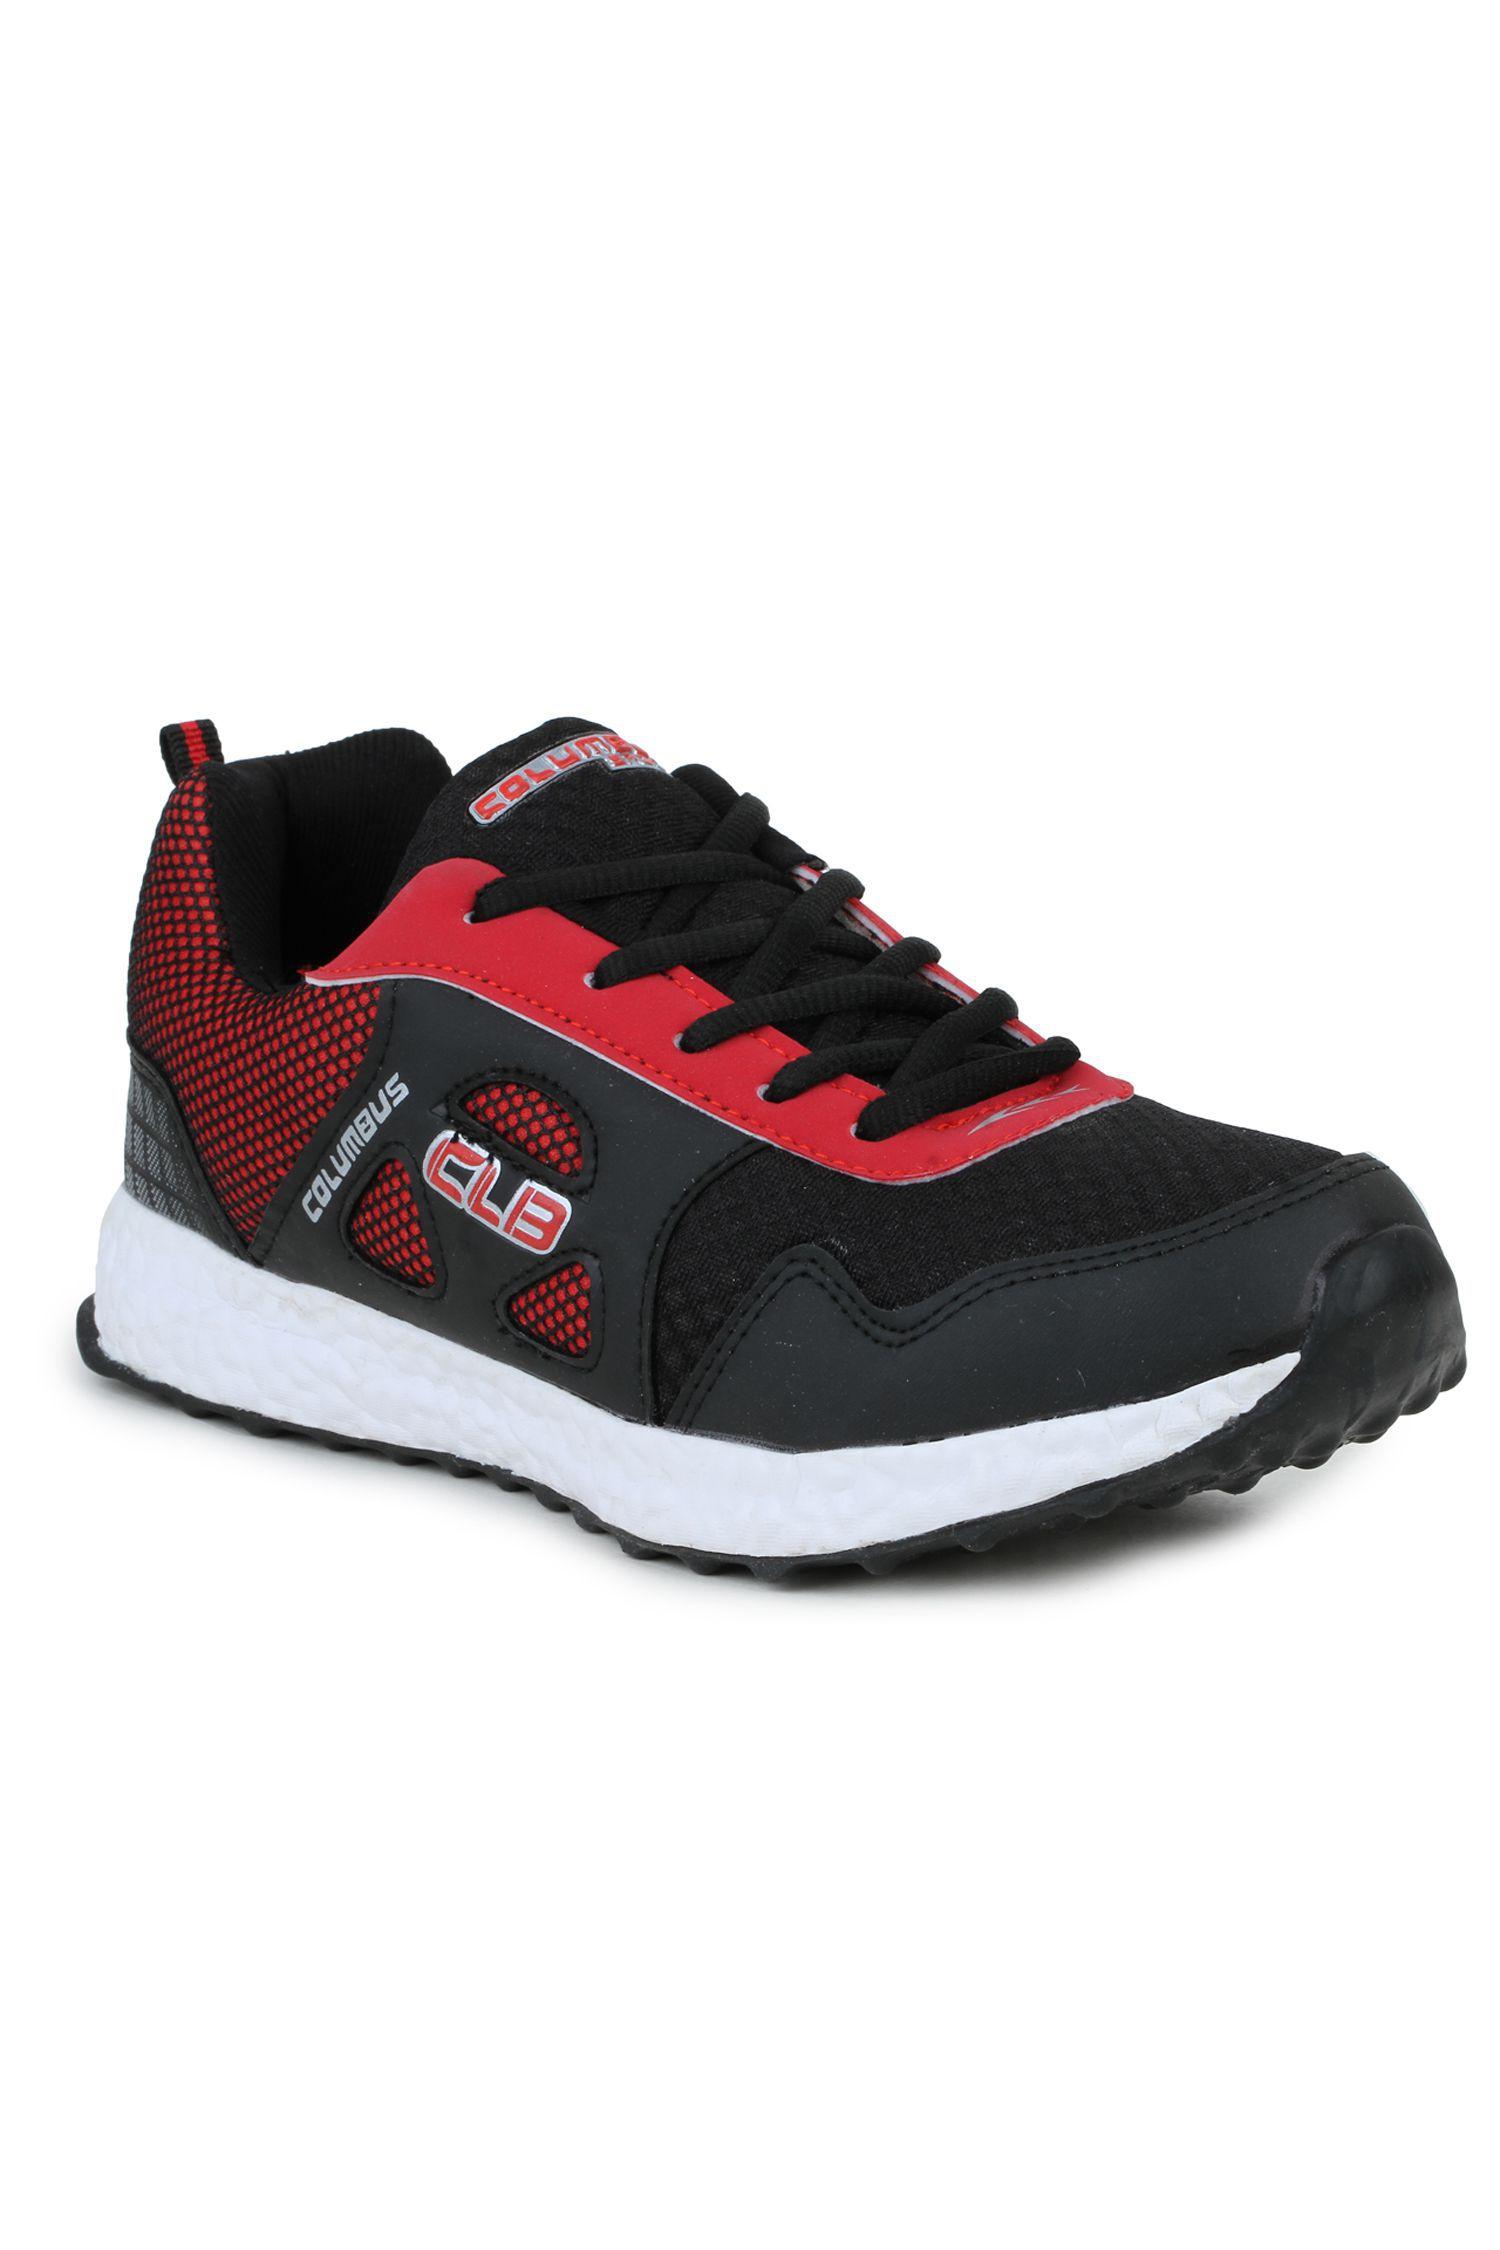 Columbus LD-0019 Black Running Shoes